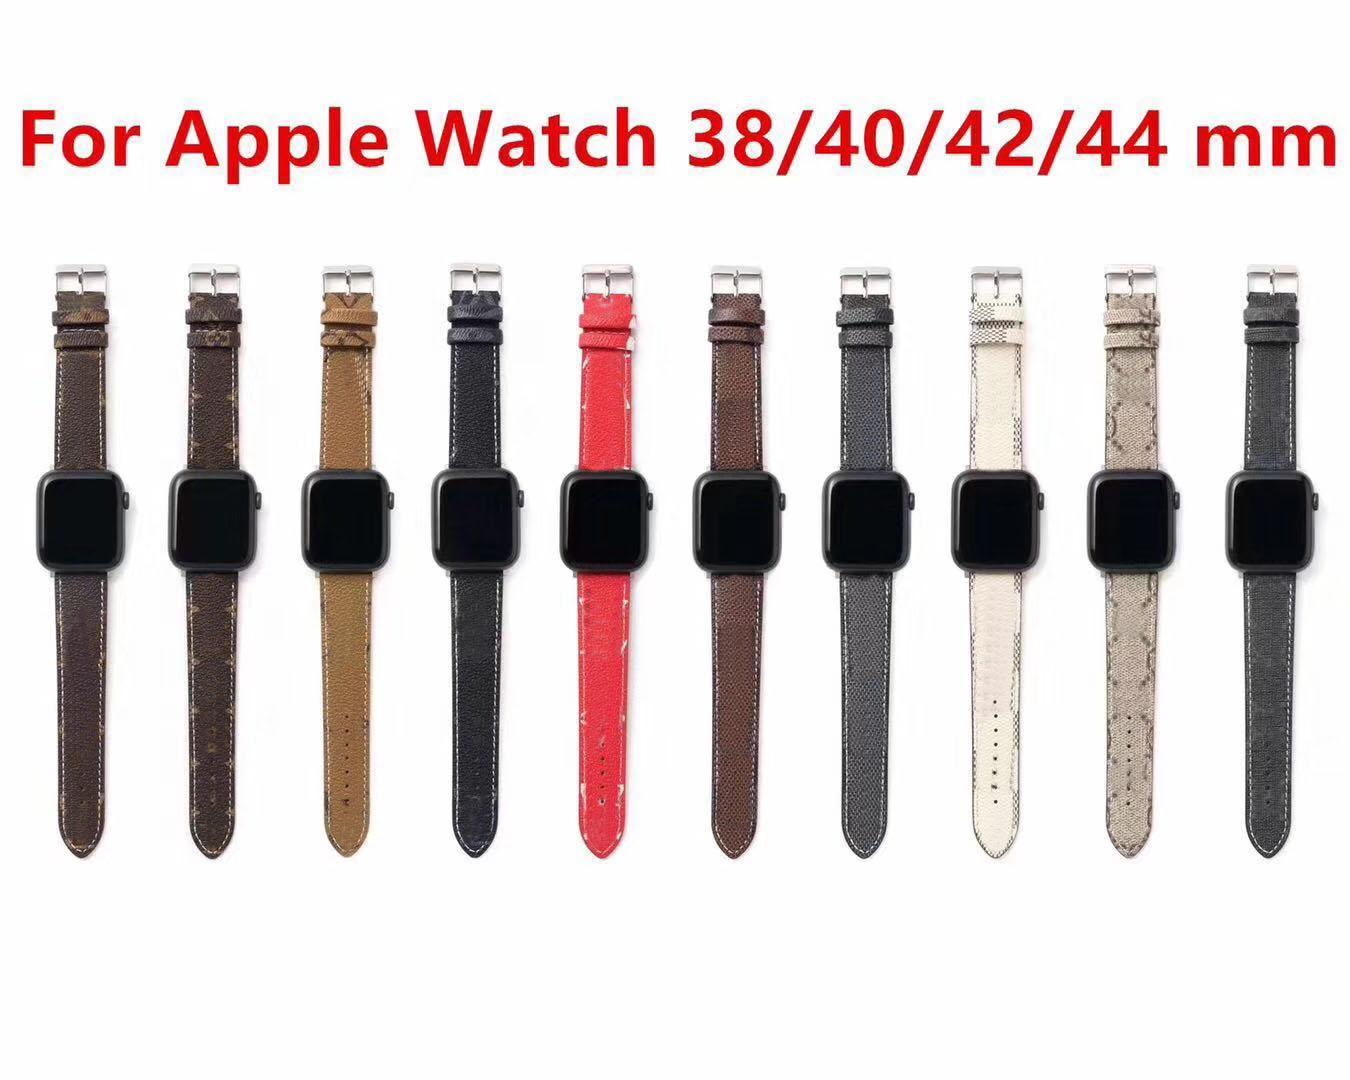 Lüks Tasarımcı Watchbands Watch Band 42mm 38mm 40mm 44mm IWatch 2 3 4 5 Bantlar Deri Kayış Bilezik Moda Stripes Watchband